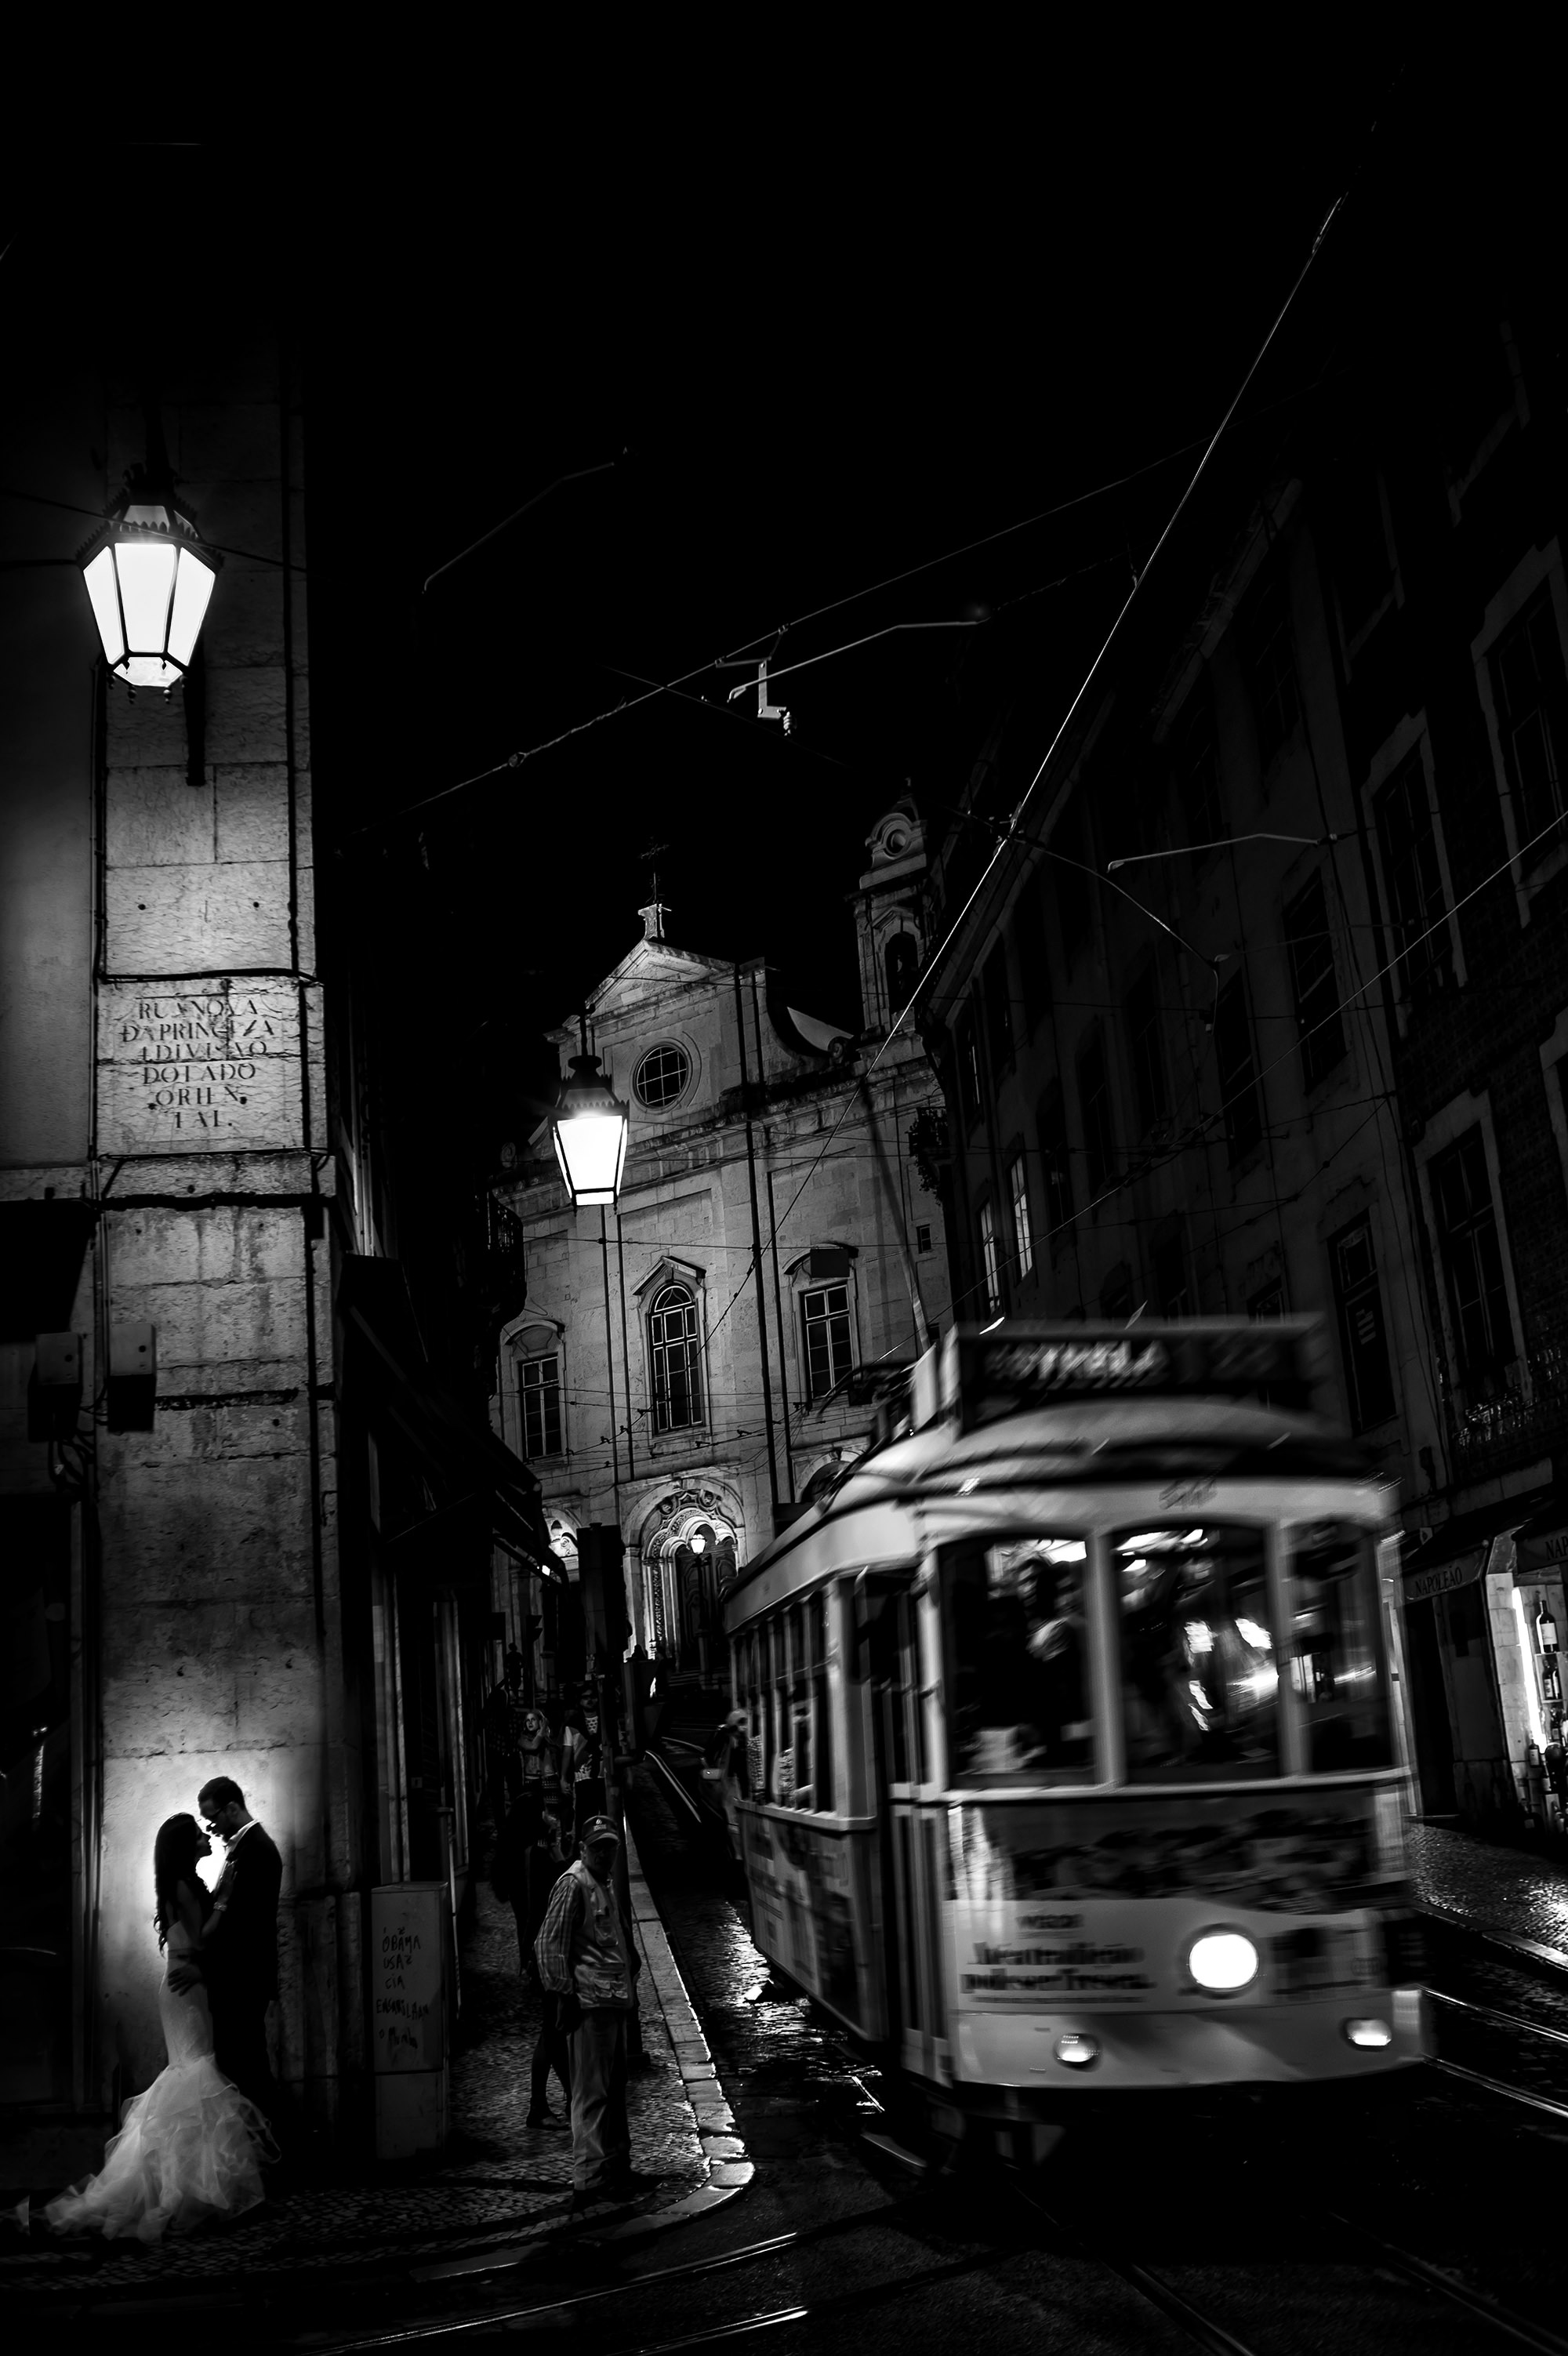 Bride and groom on street corner with moving tram - Davina + Daniel